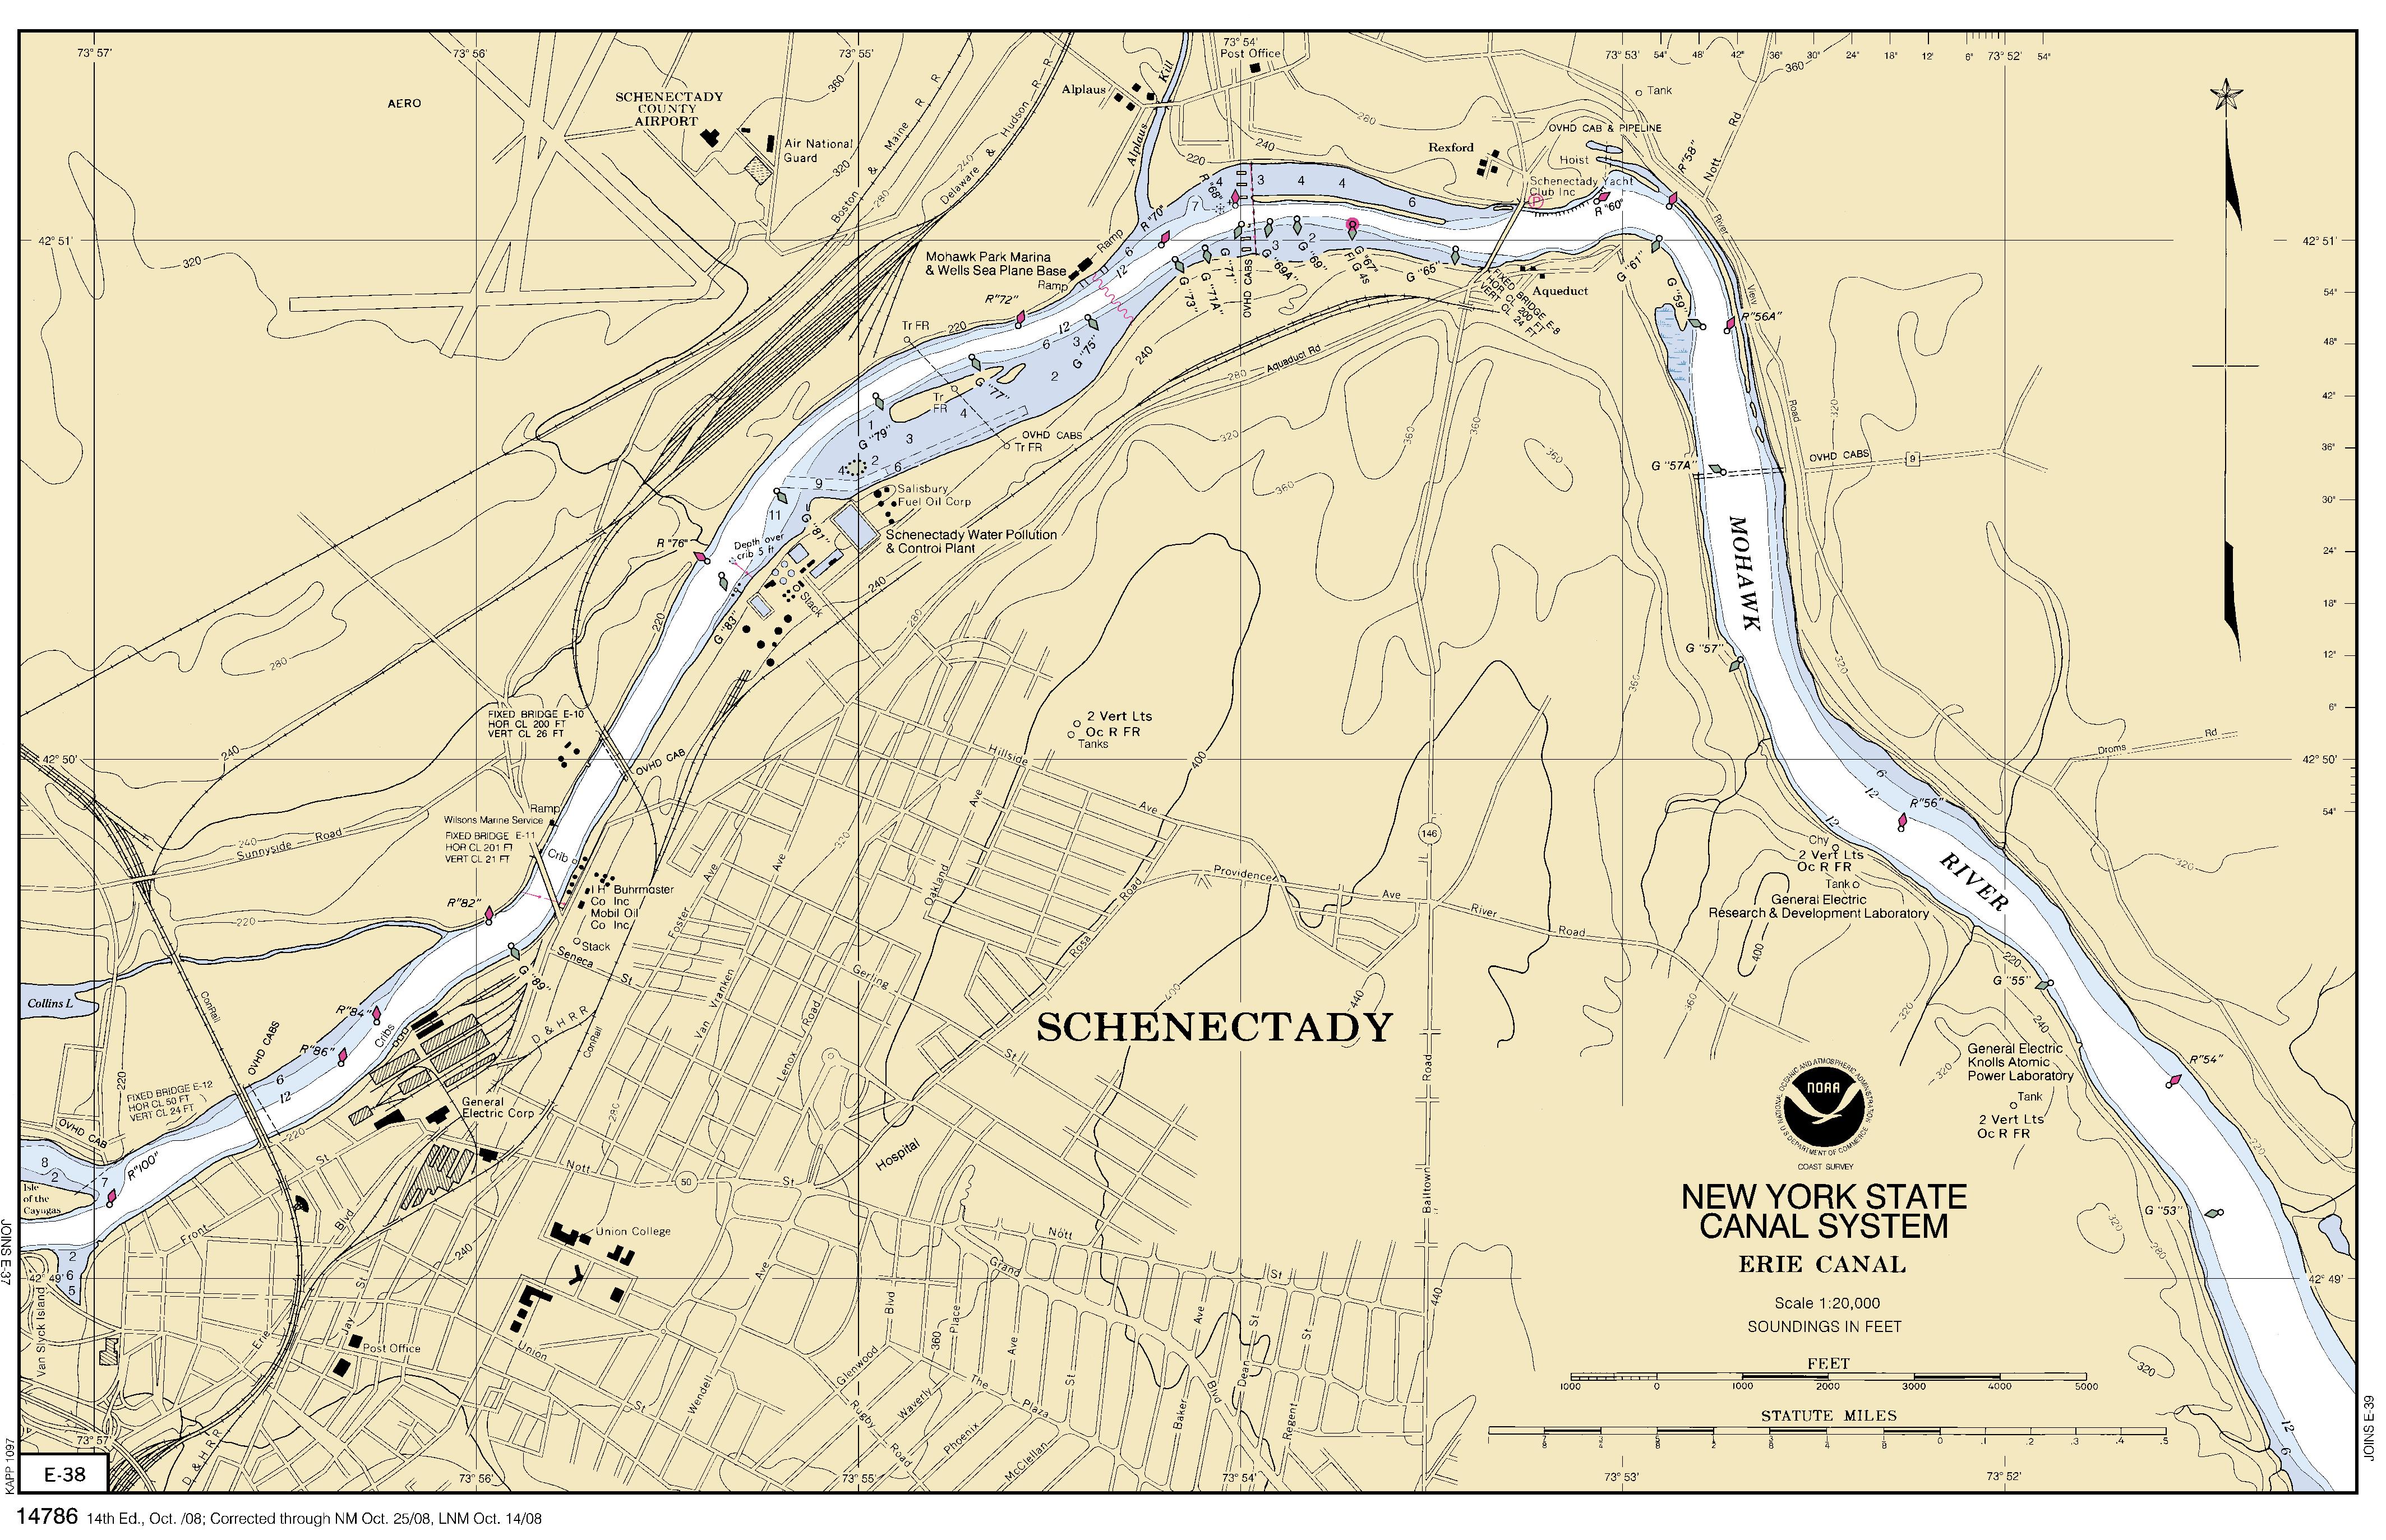 Mohawk River Map MOHAWK RIVER   SCHENECTADY nautical chart   ΝΟΑΑ Charts   maps Mohawk River Map